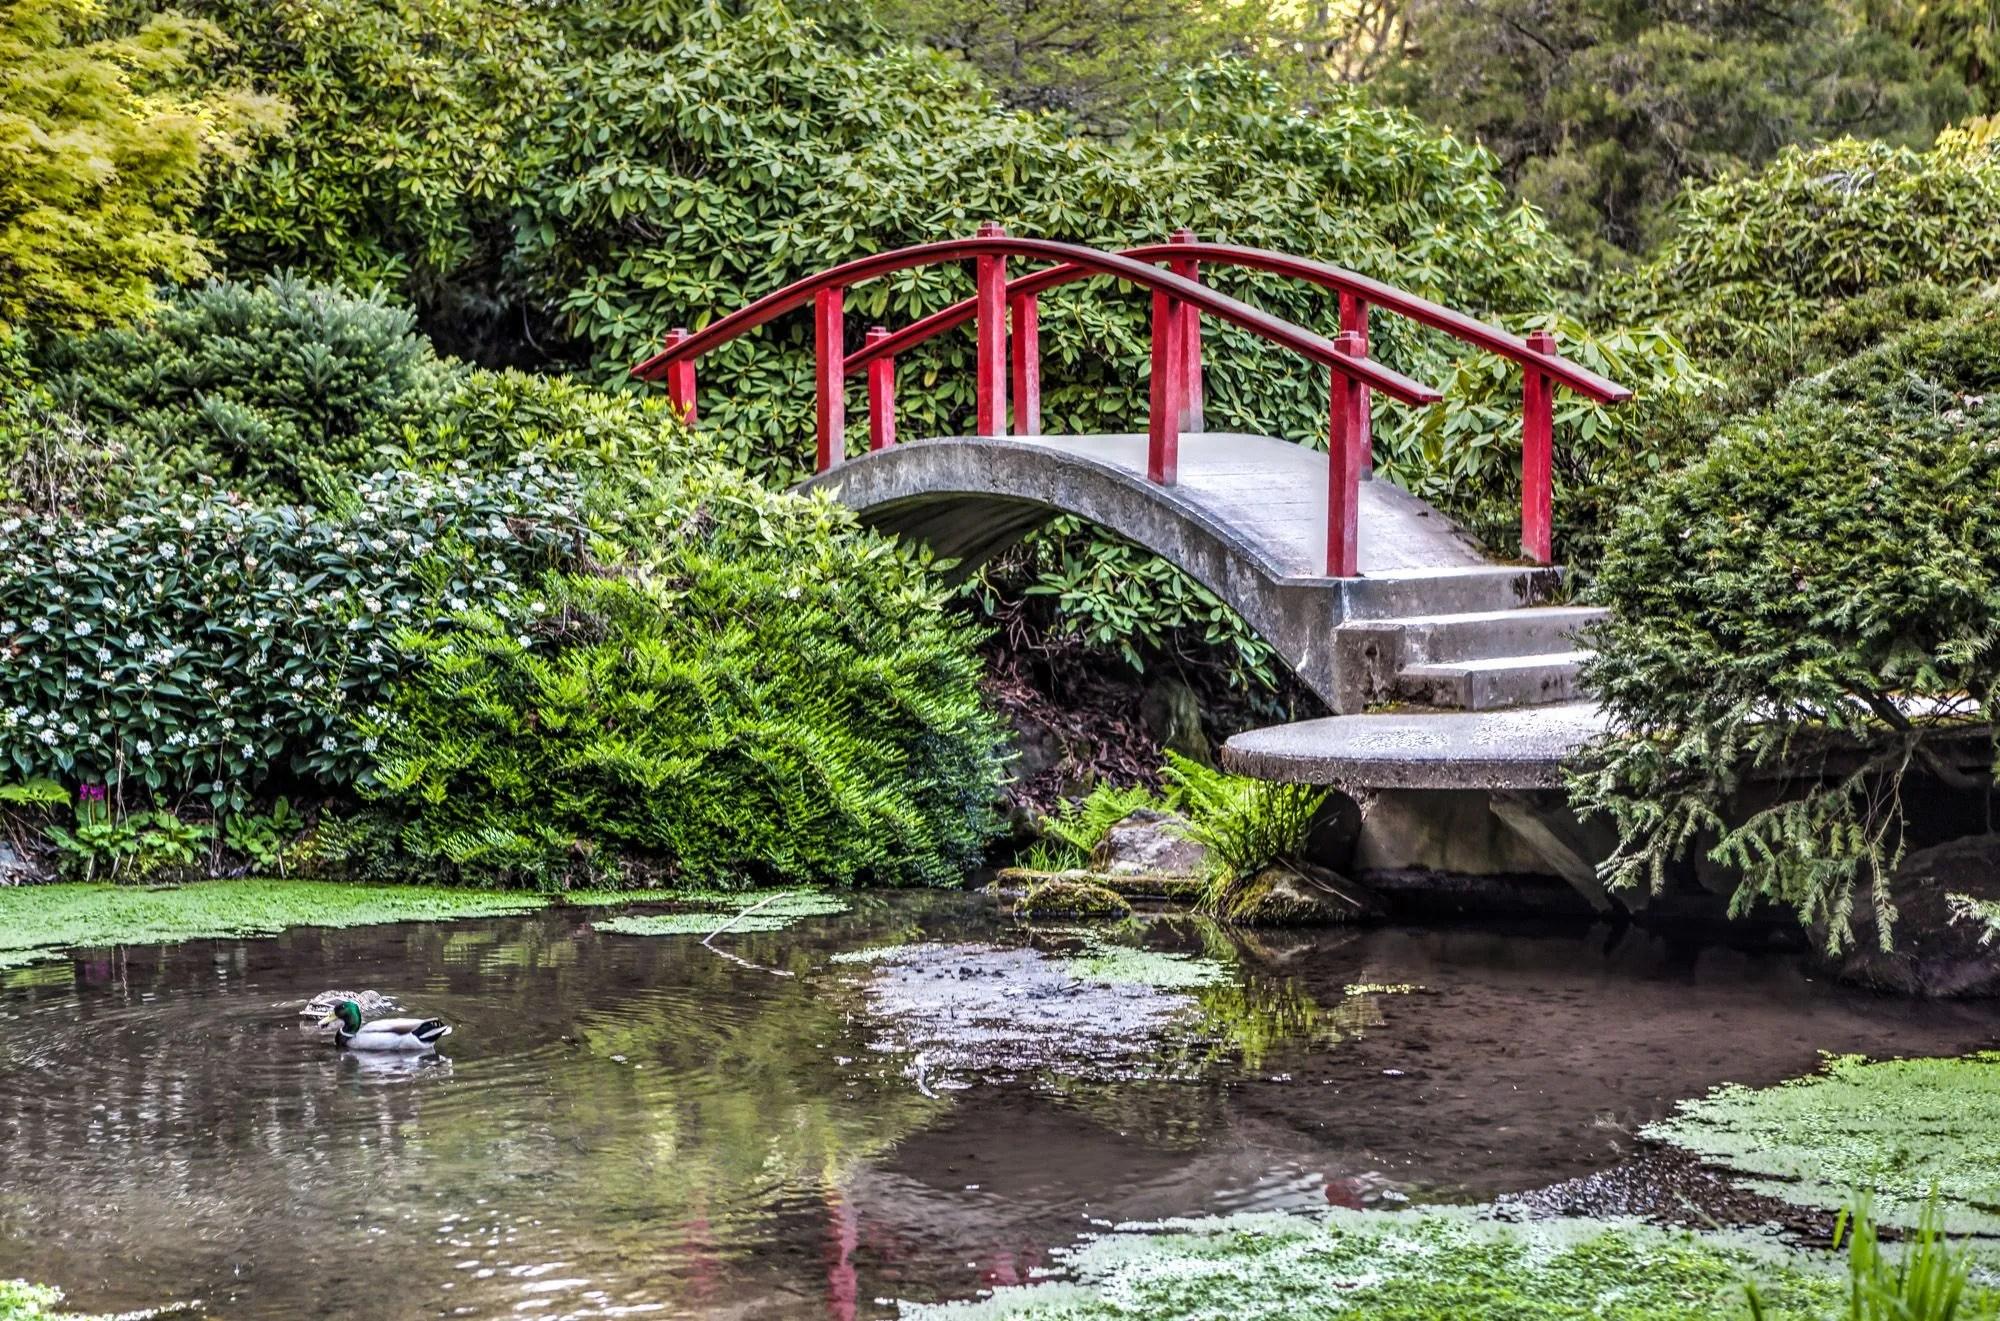 Kubota Garden – An amazing Japanese Garden in Seattle